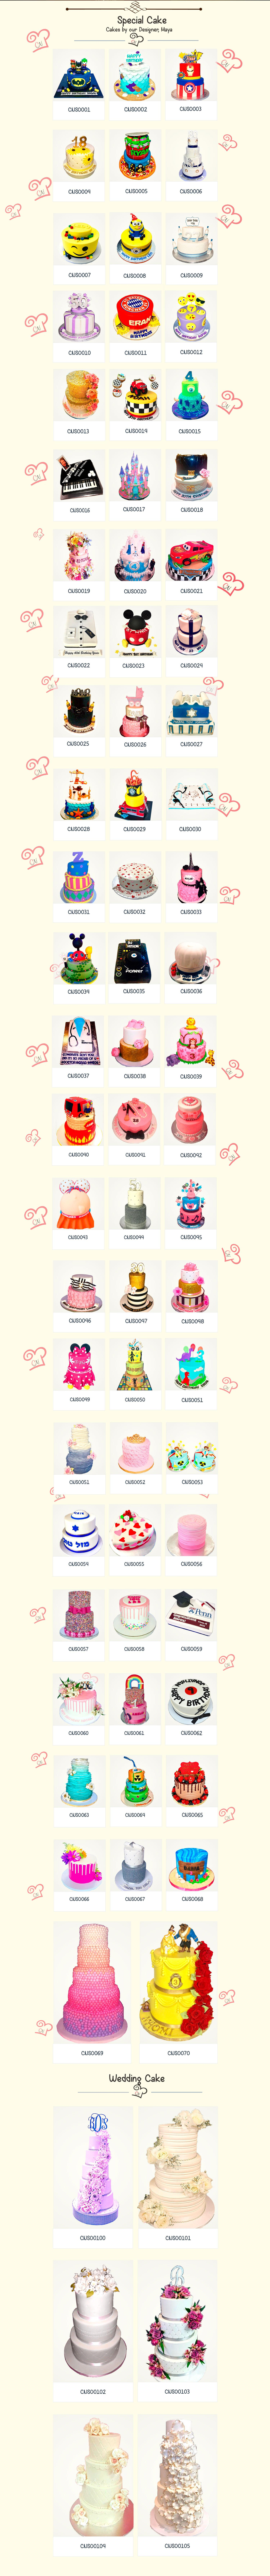 specialcake-birthday-cake-chefness-bakery-kosher-cake-mazal-tov-beauty-and-beast